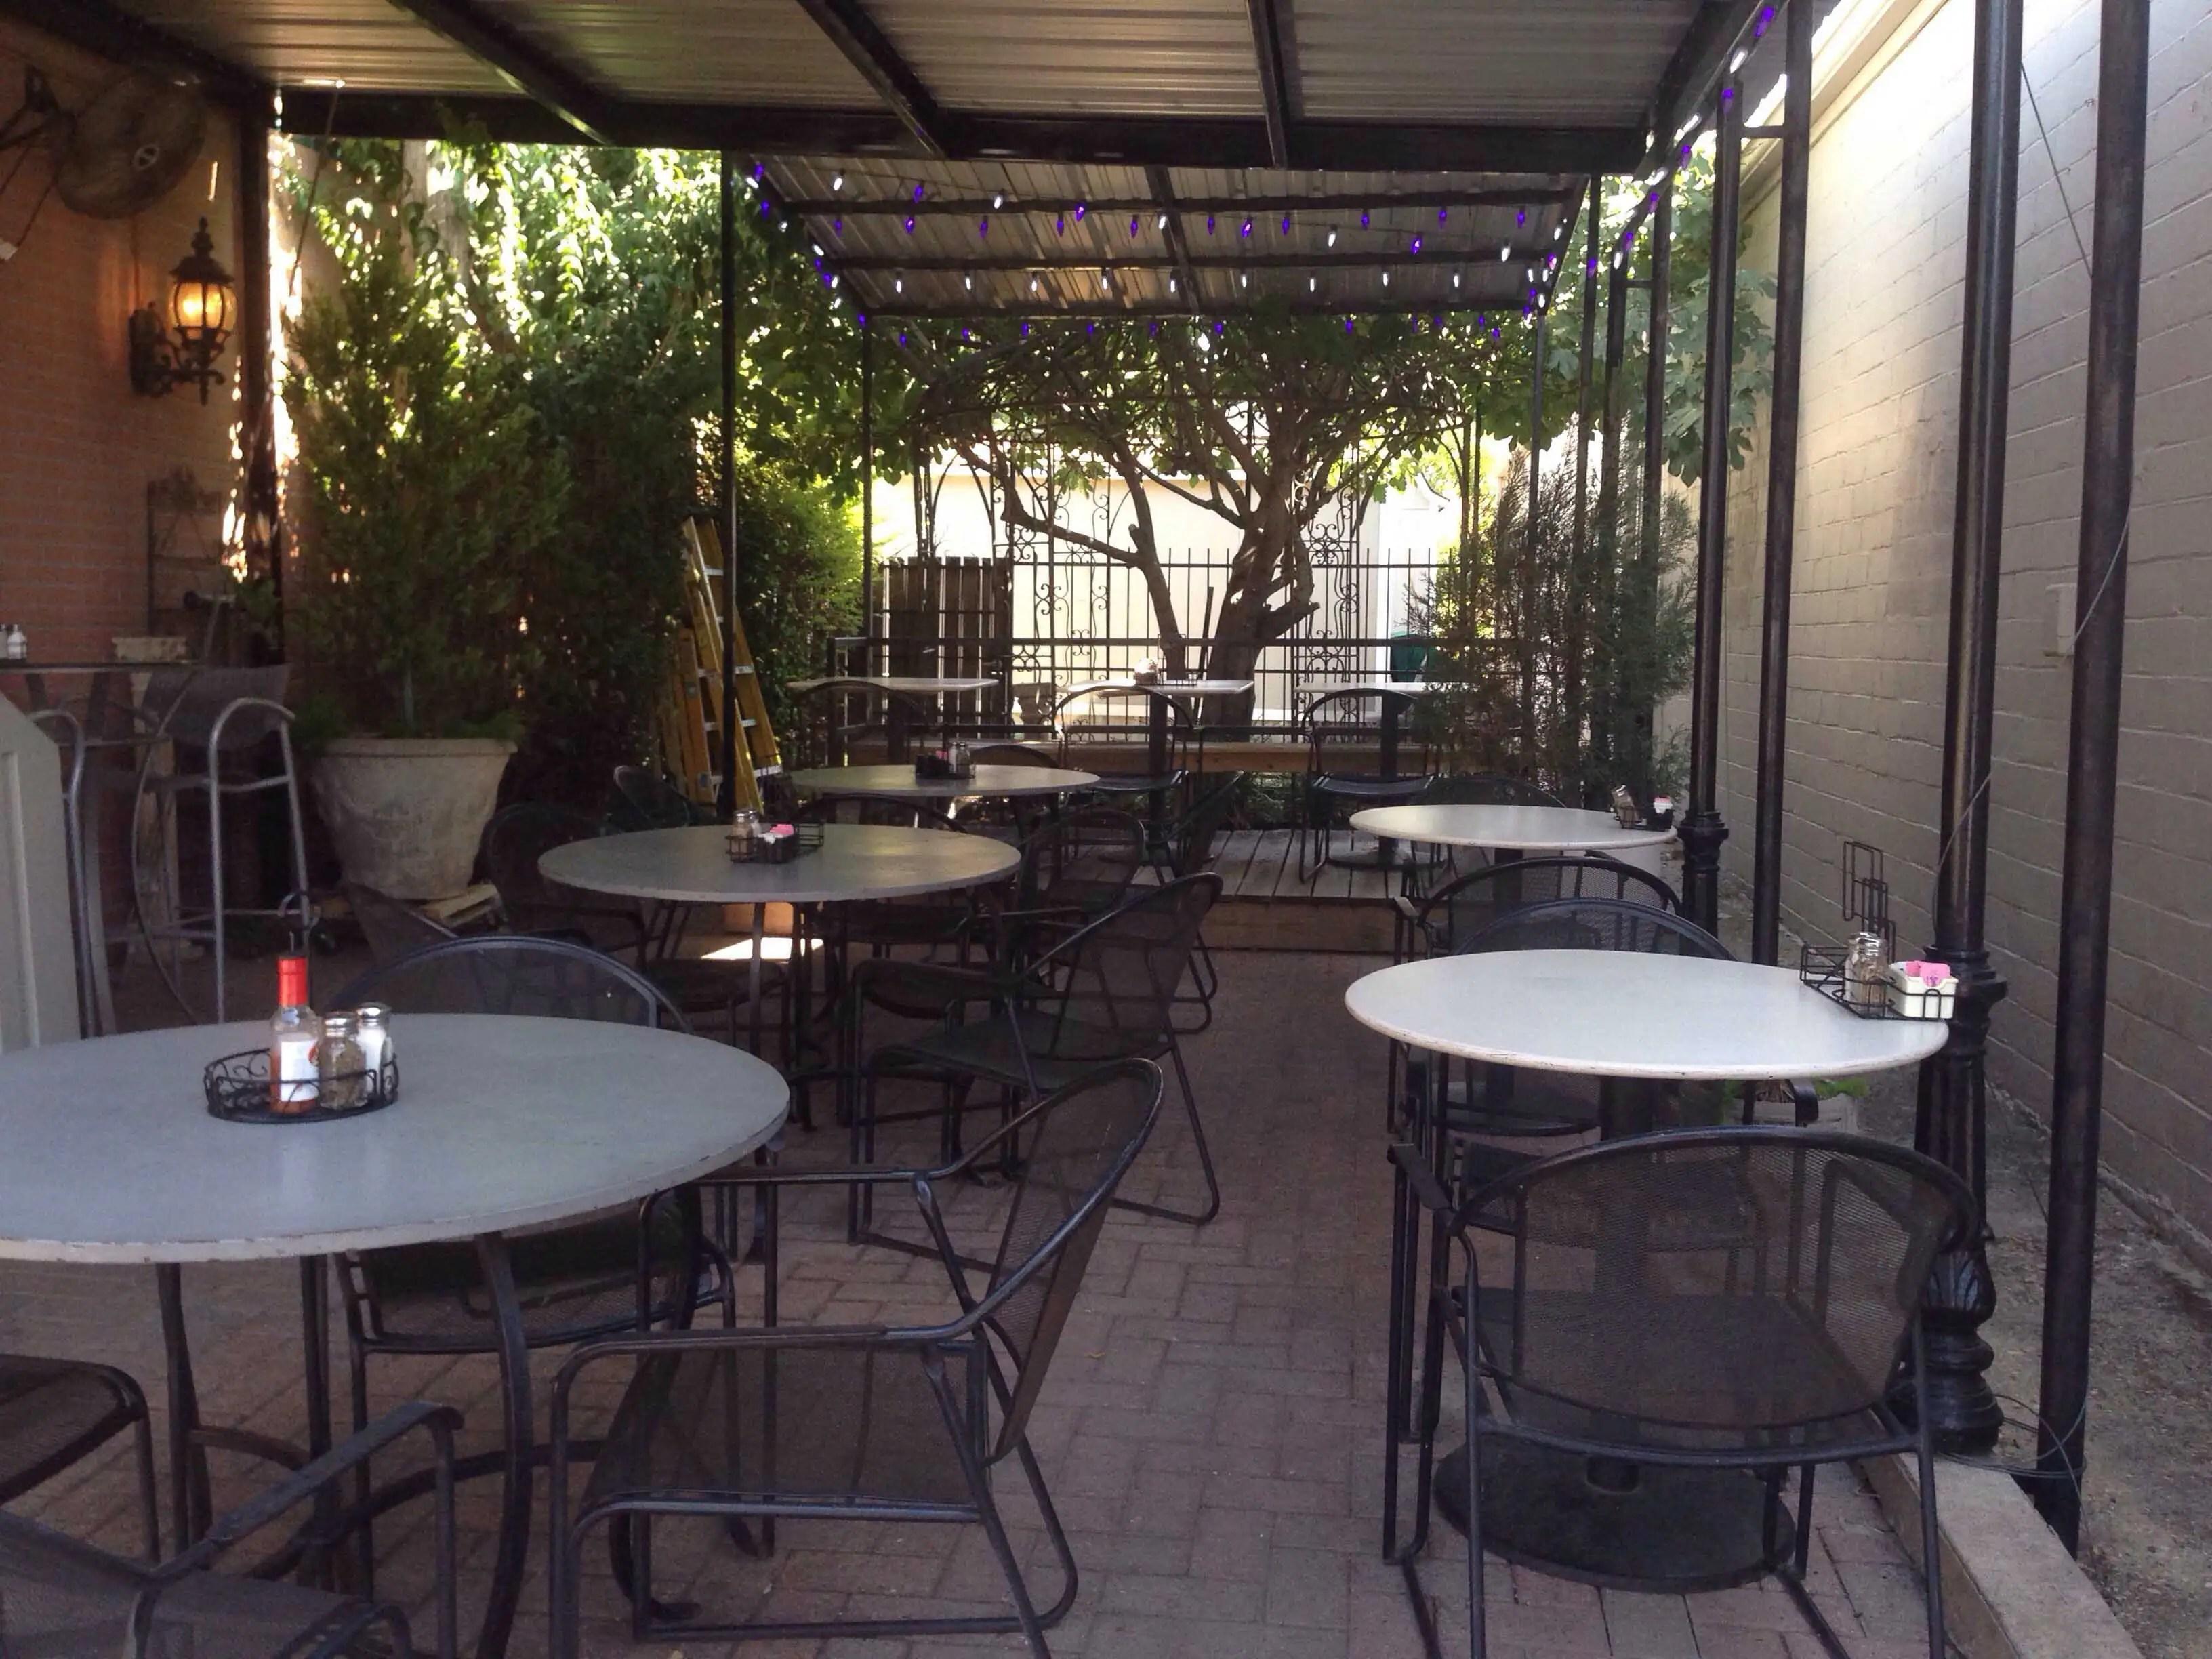 shaw s patio bar grill menu menu for